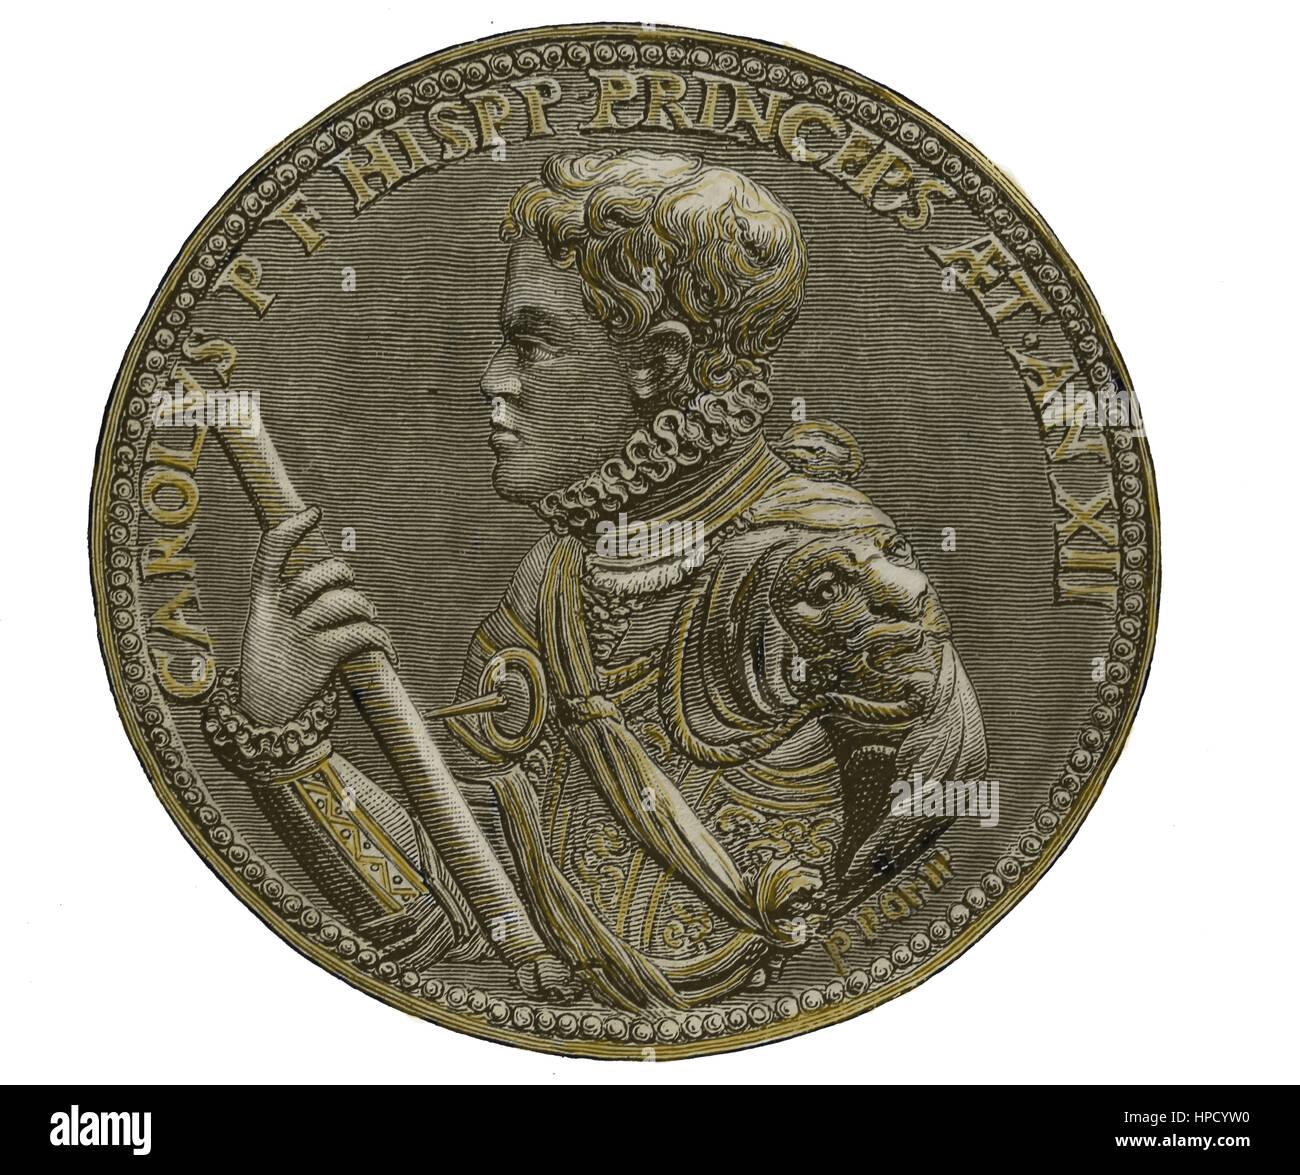 Carlos, Prince of Austrias (1545-1568). Son of Philip II of Spain. Medallion. Portrait. Engraving. Color. - Stock Image